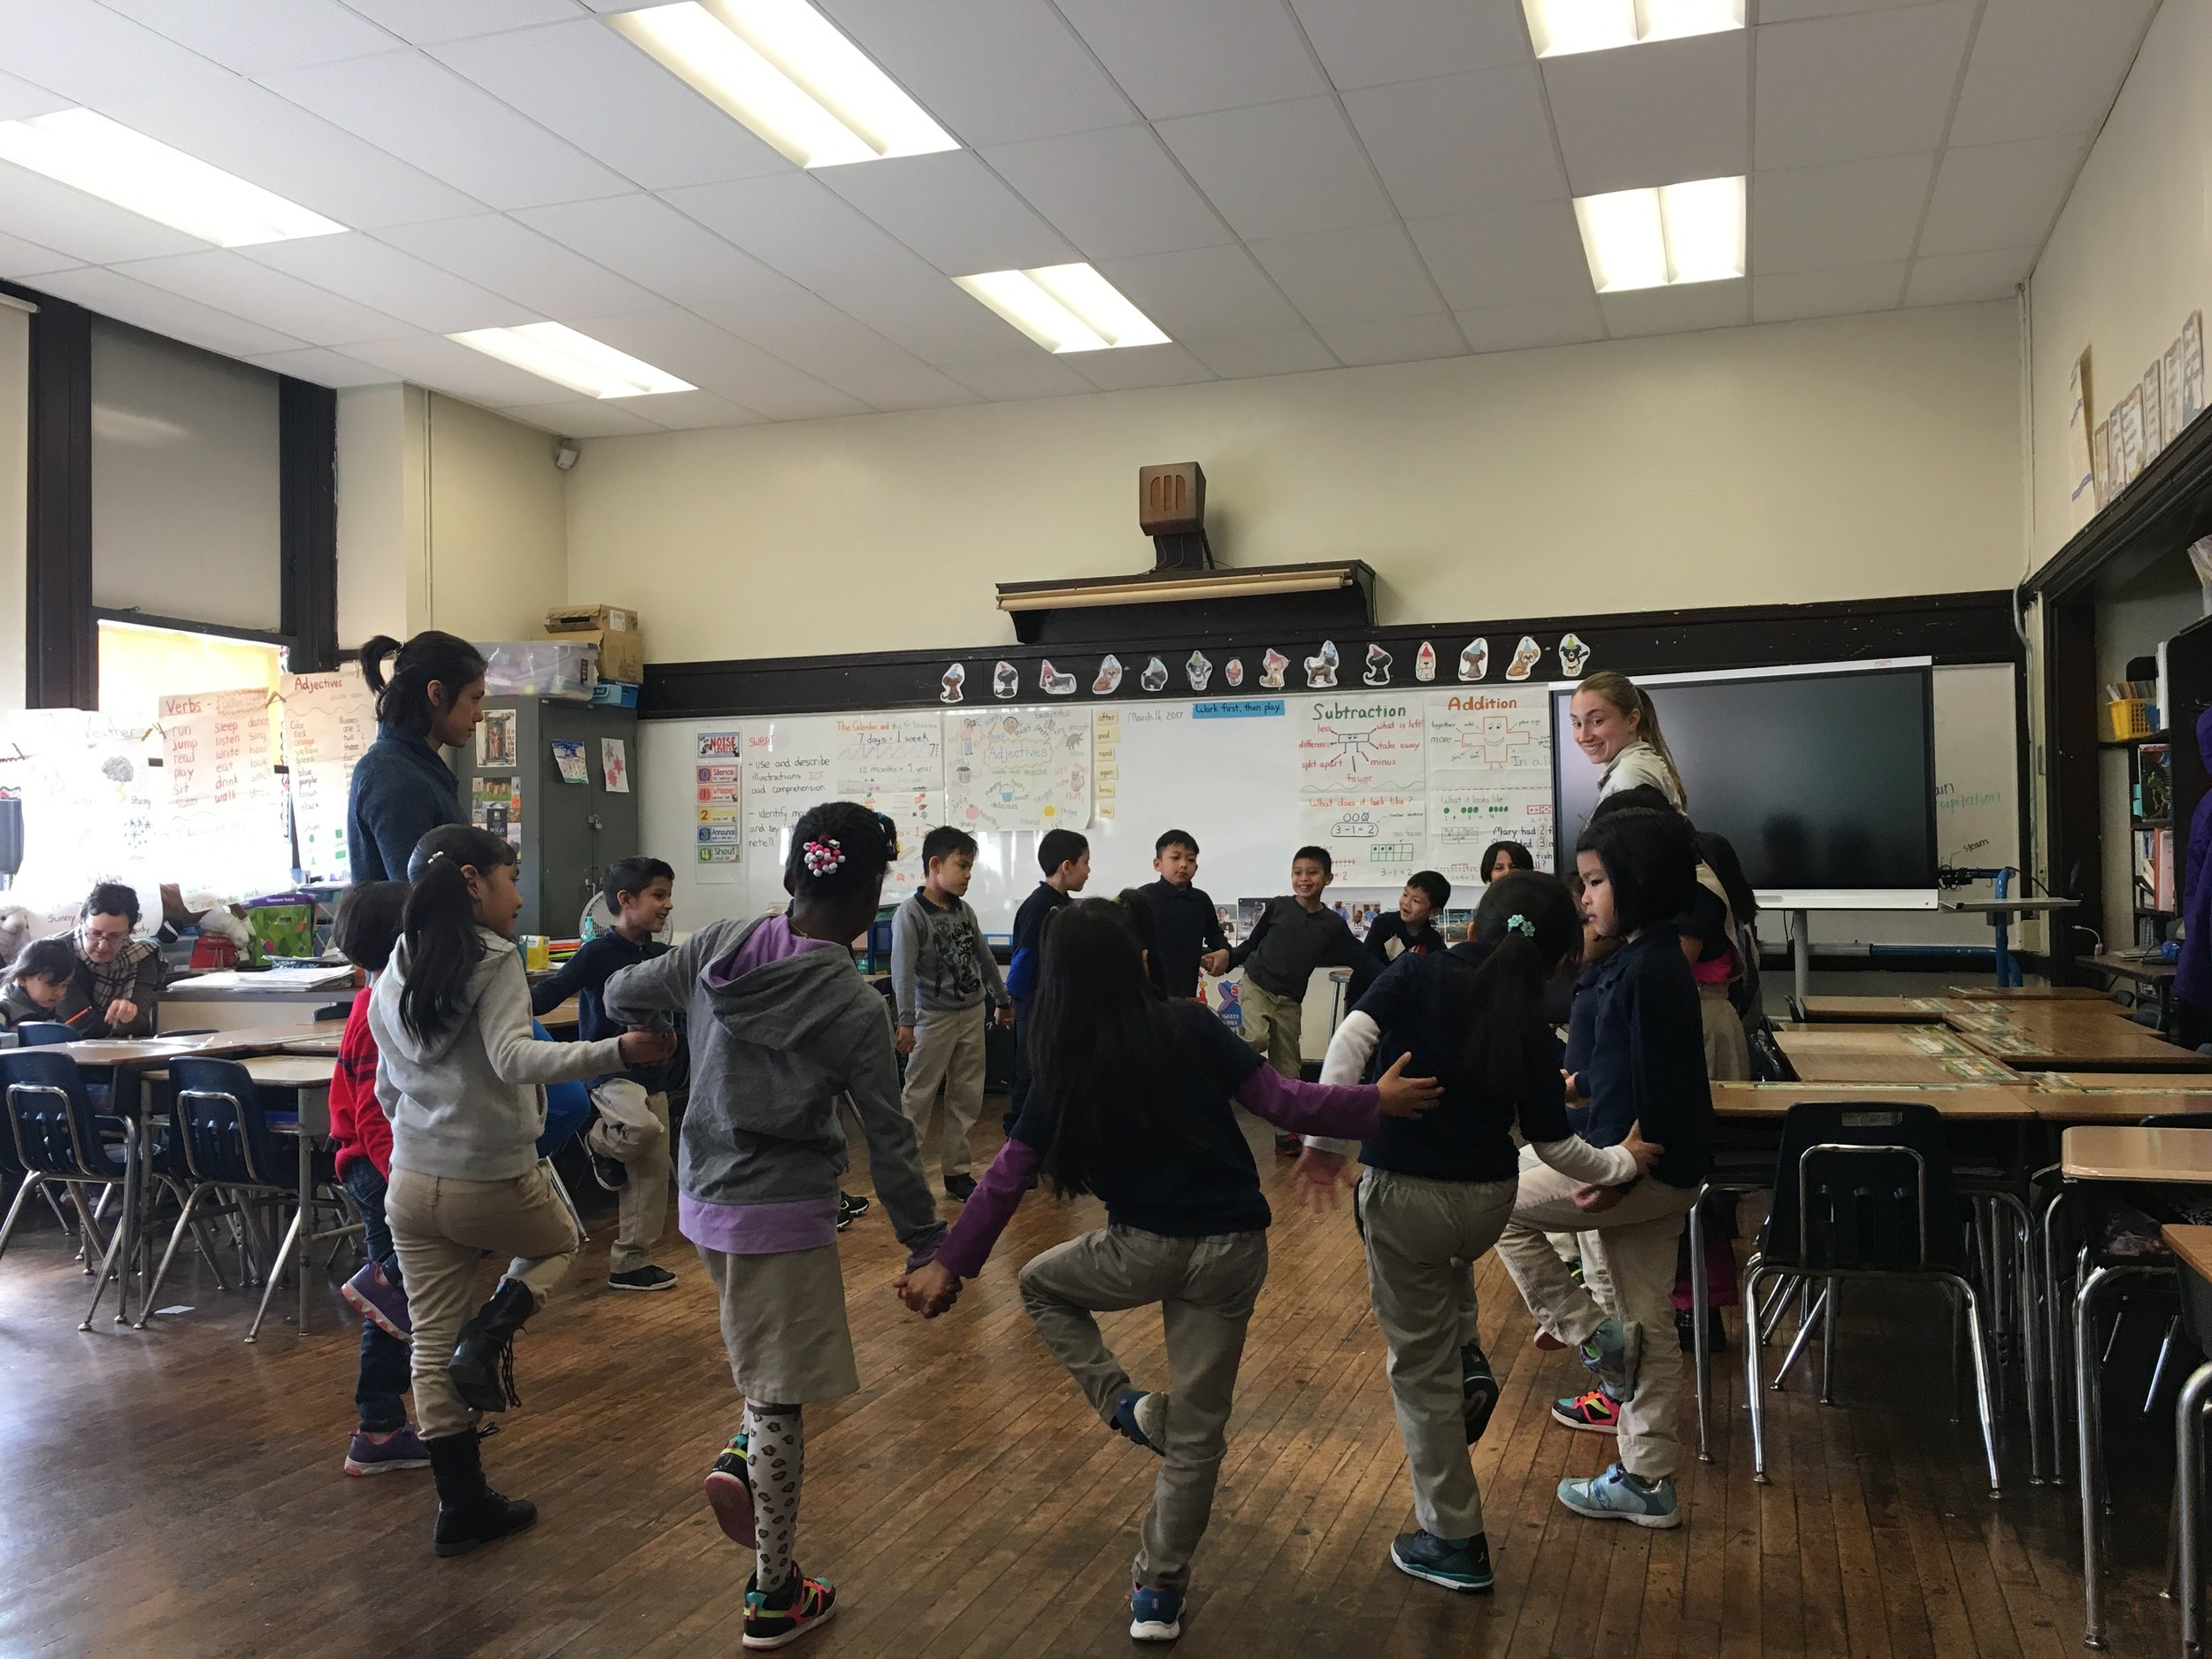 CHI Dance classes at Southwark School